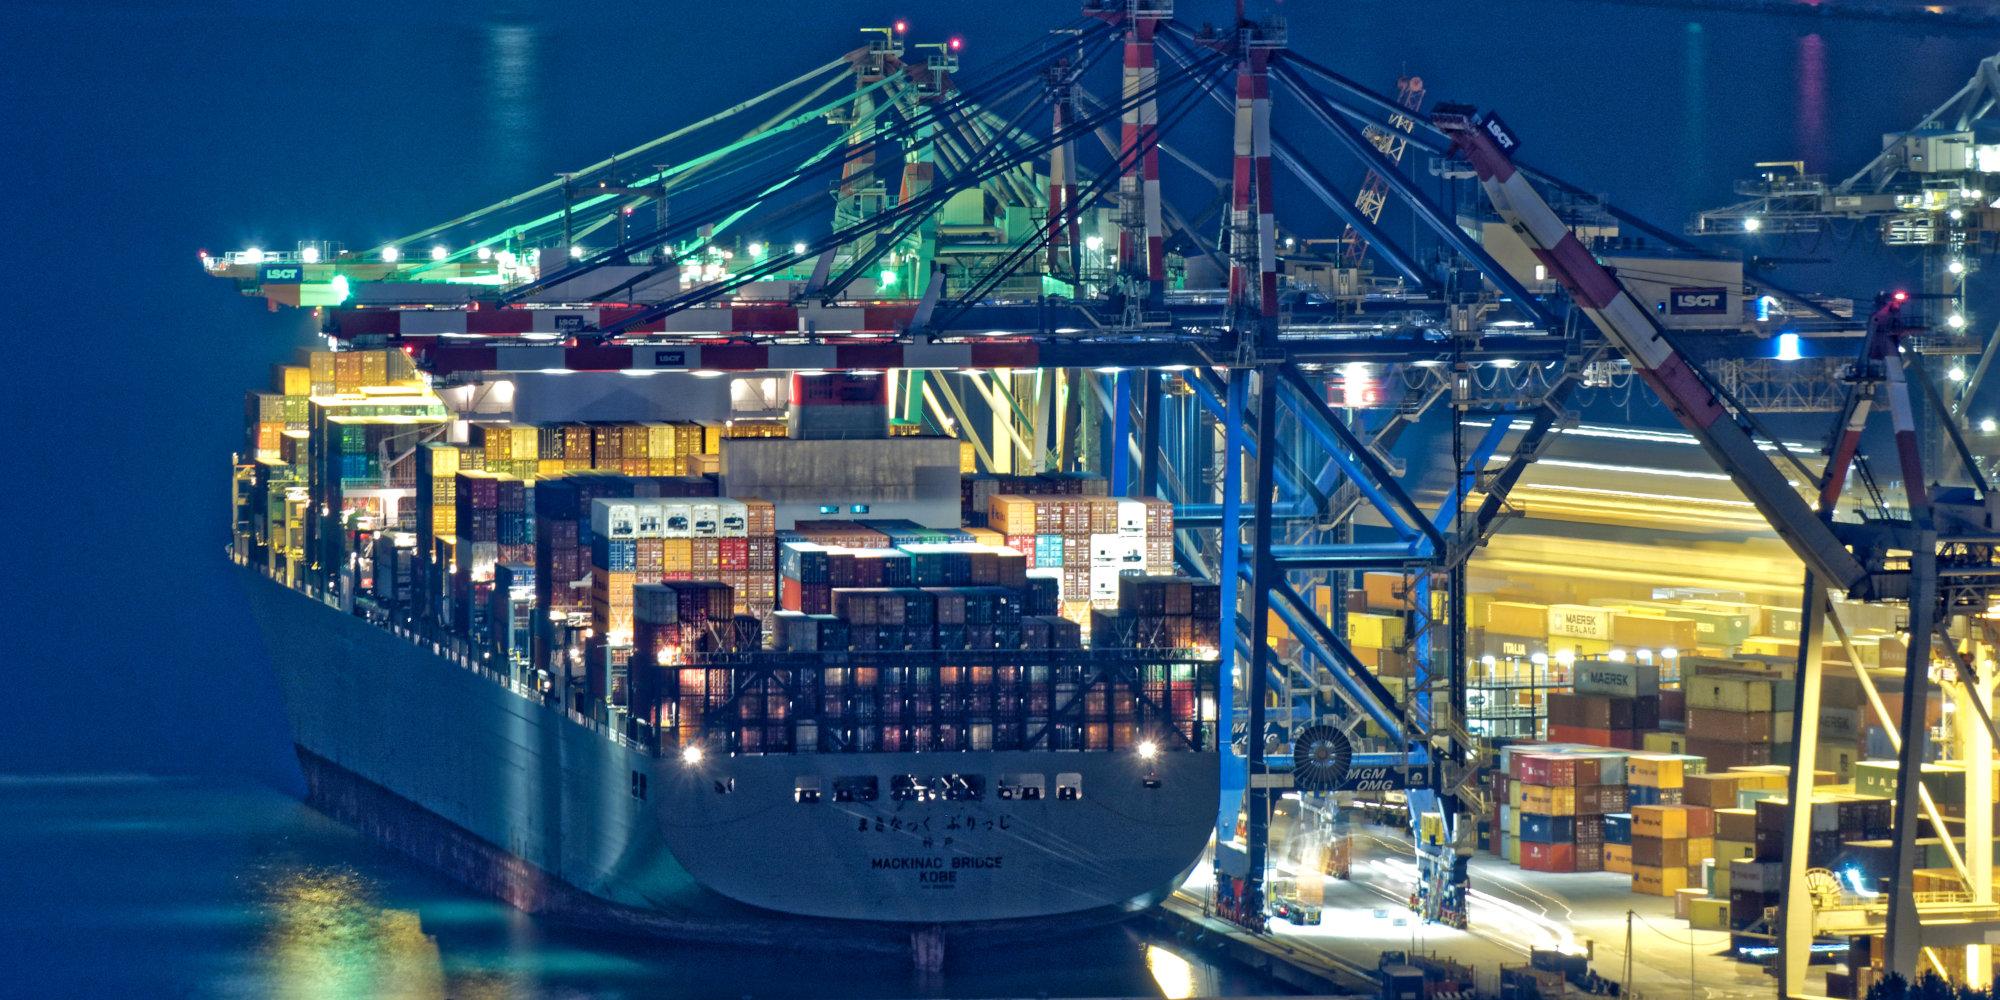 porti-italiani-piu-importanti-e-performance